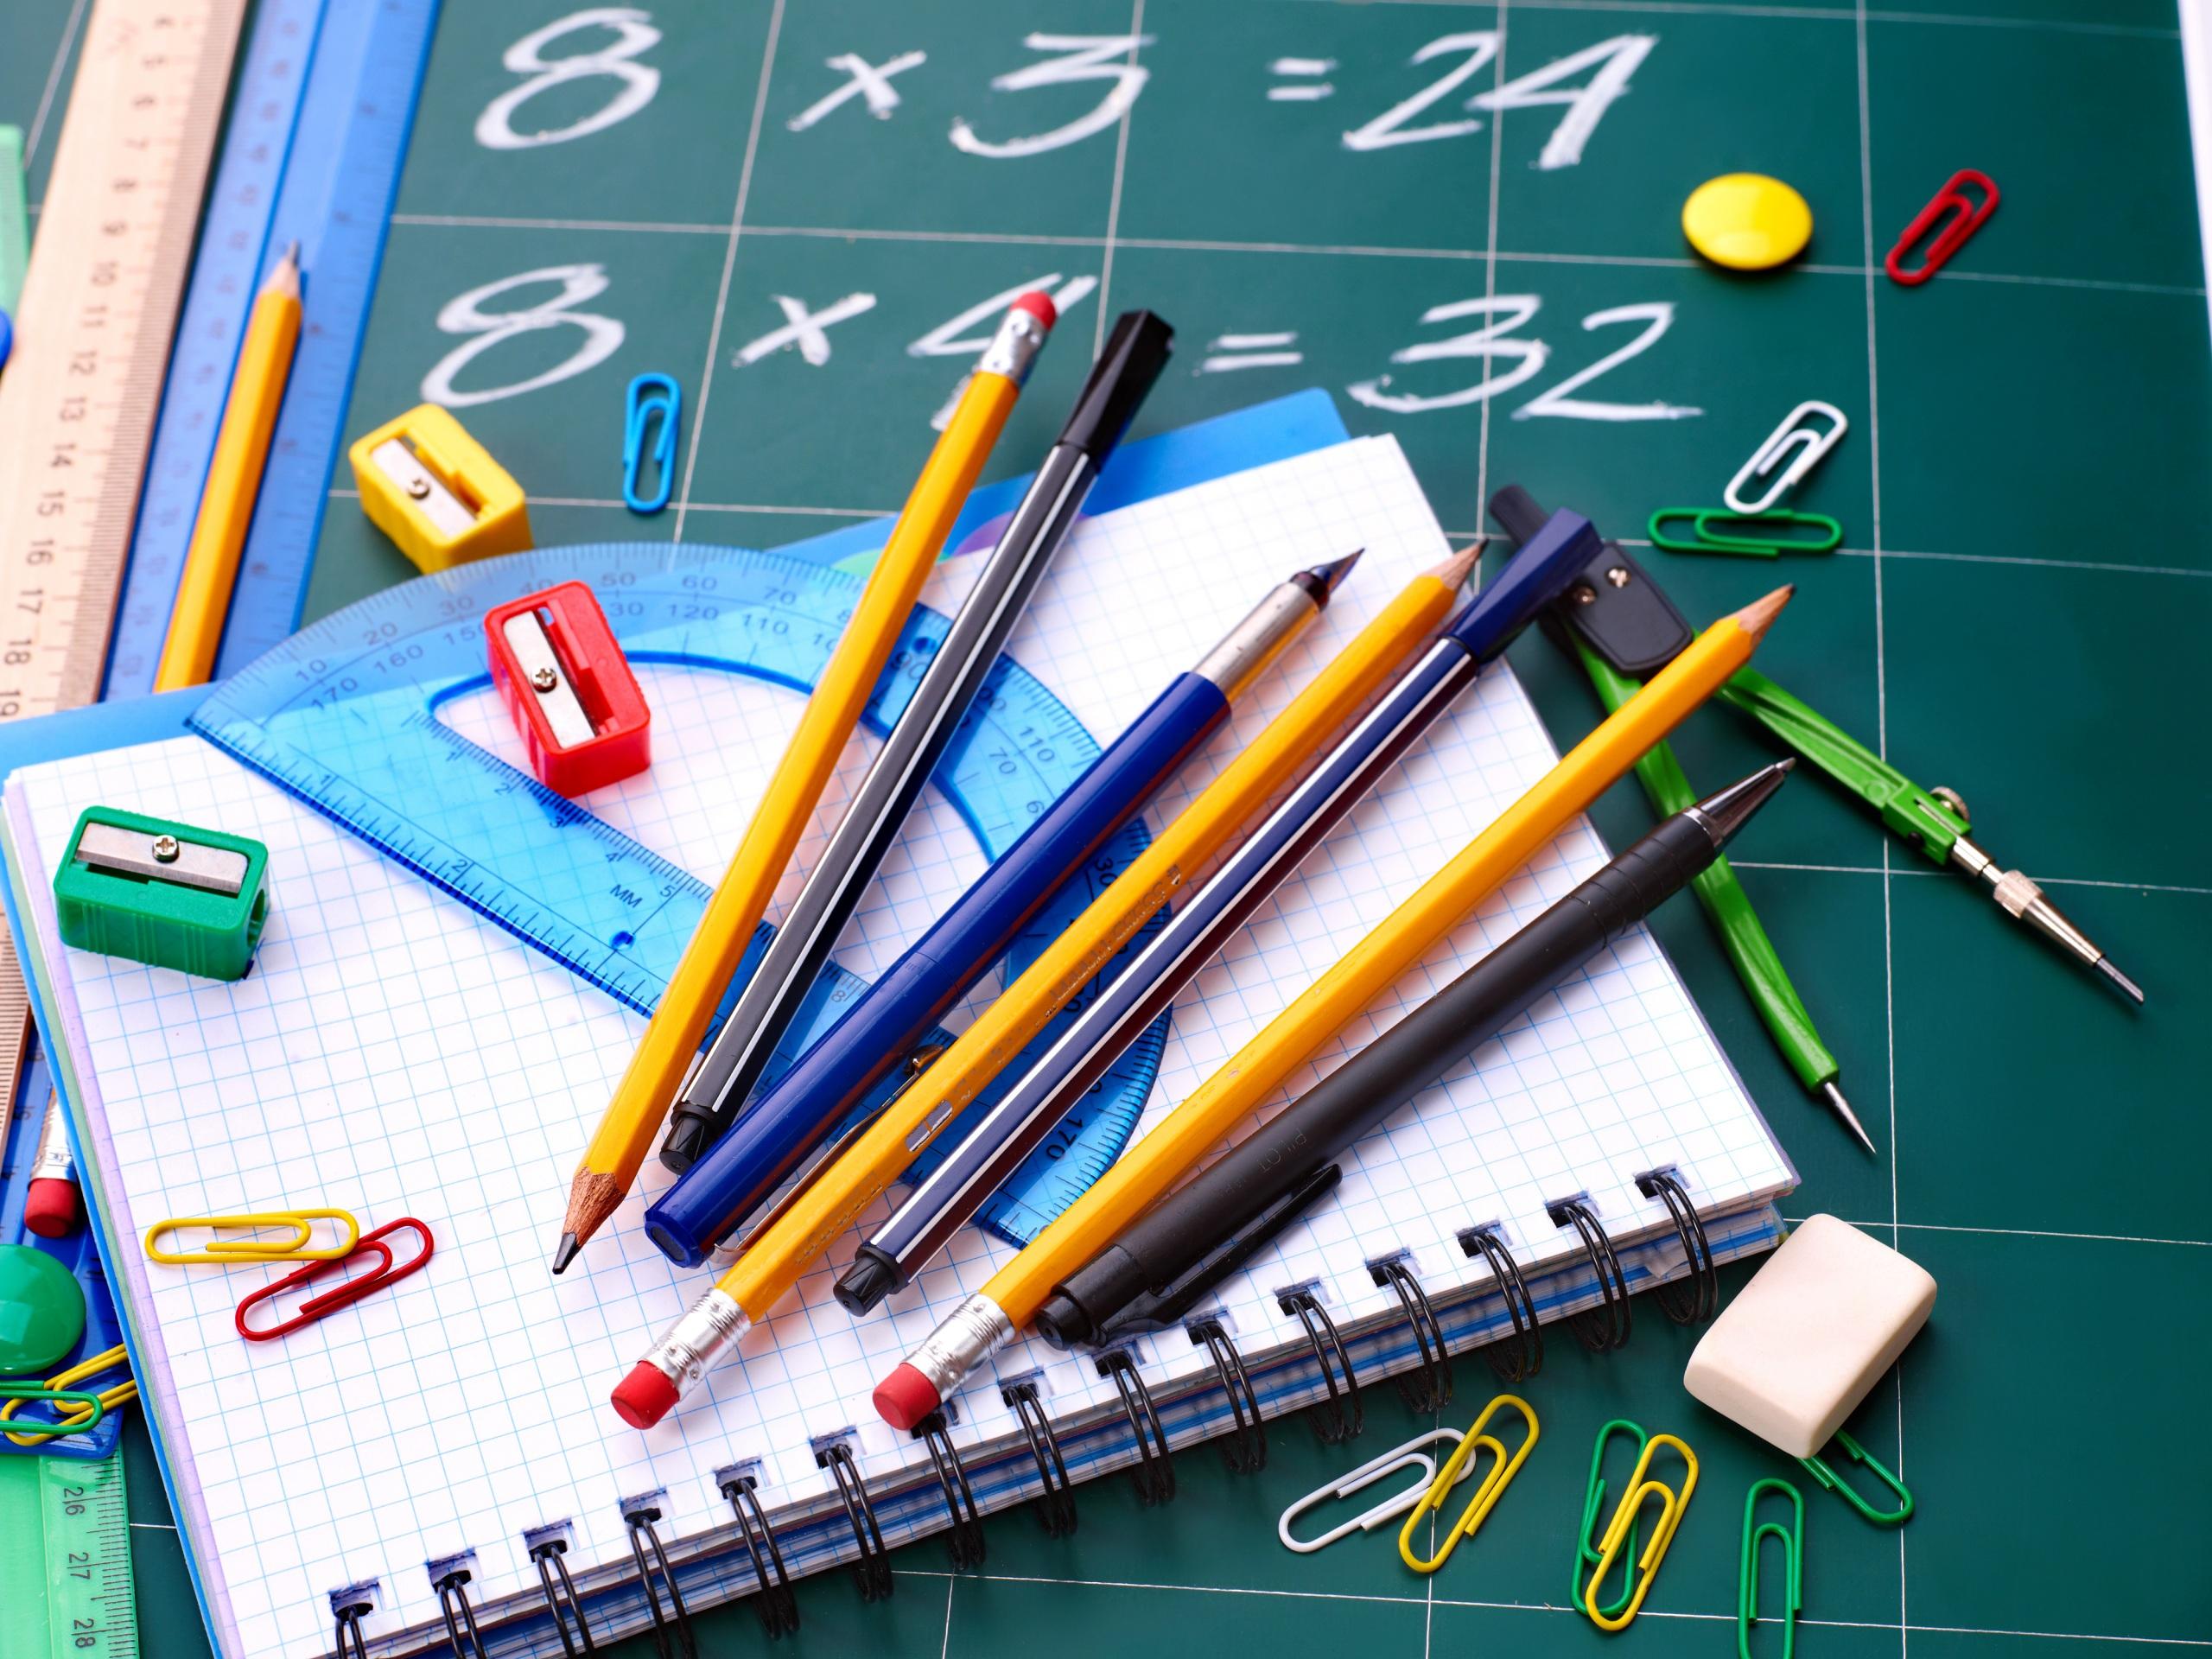 Обои Школа Карандаши Шариковая ручка Тетрадь 2560x1920 школьные карандаш карандаша карандашей